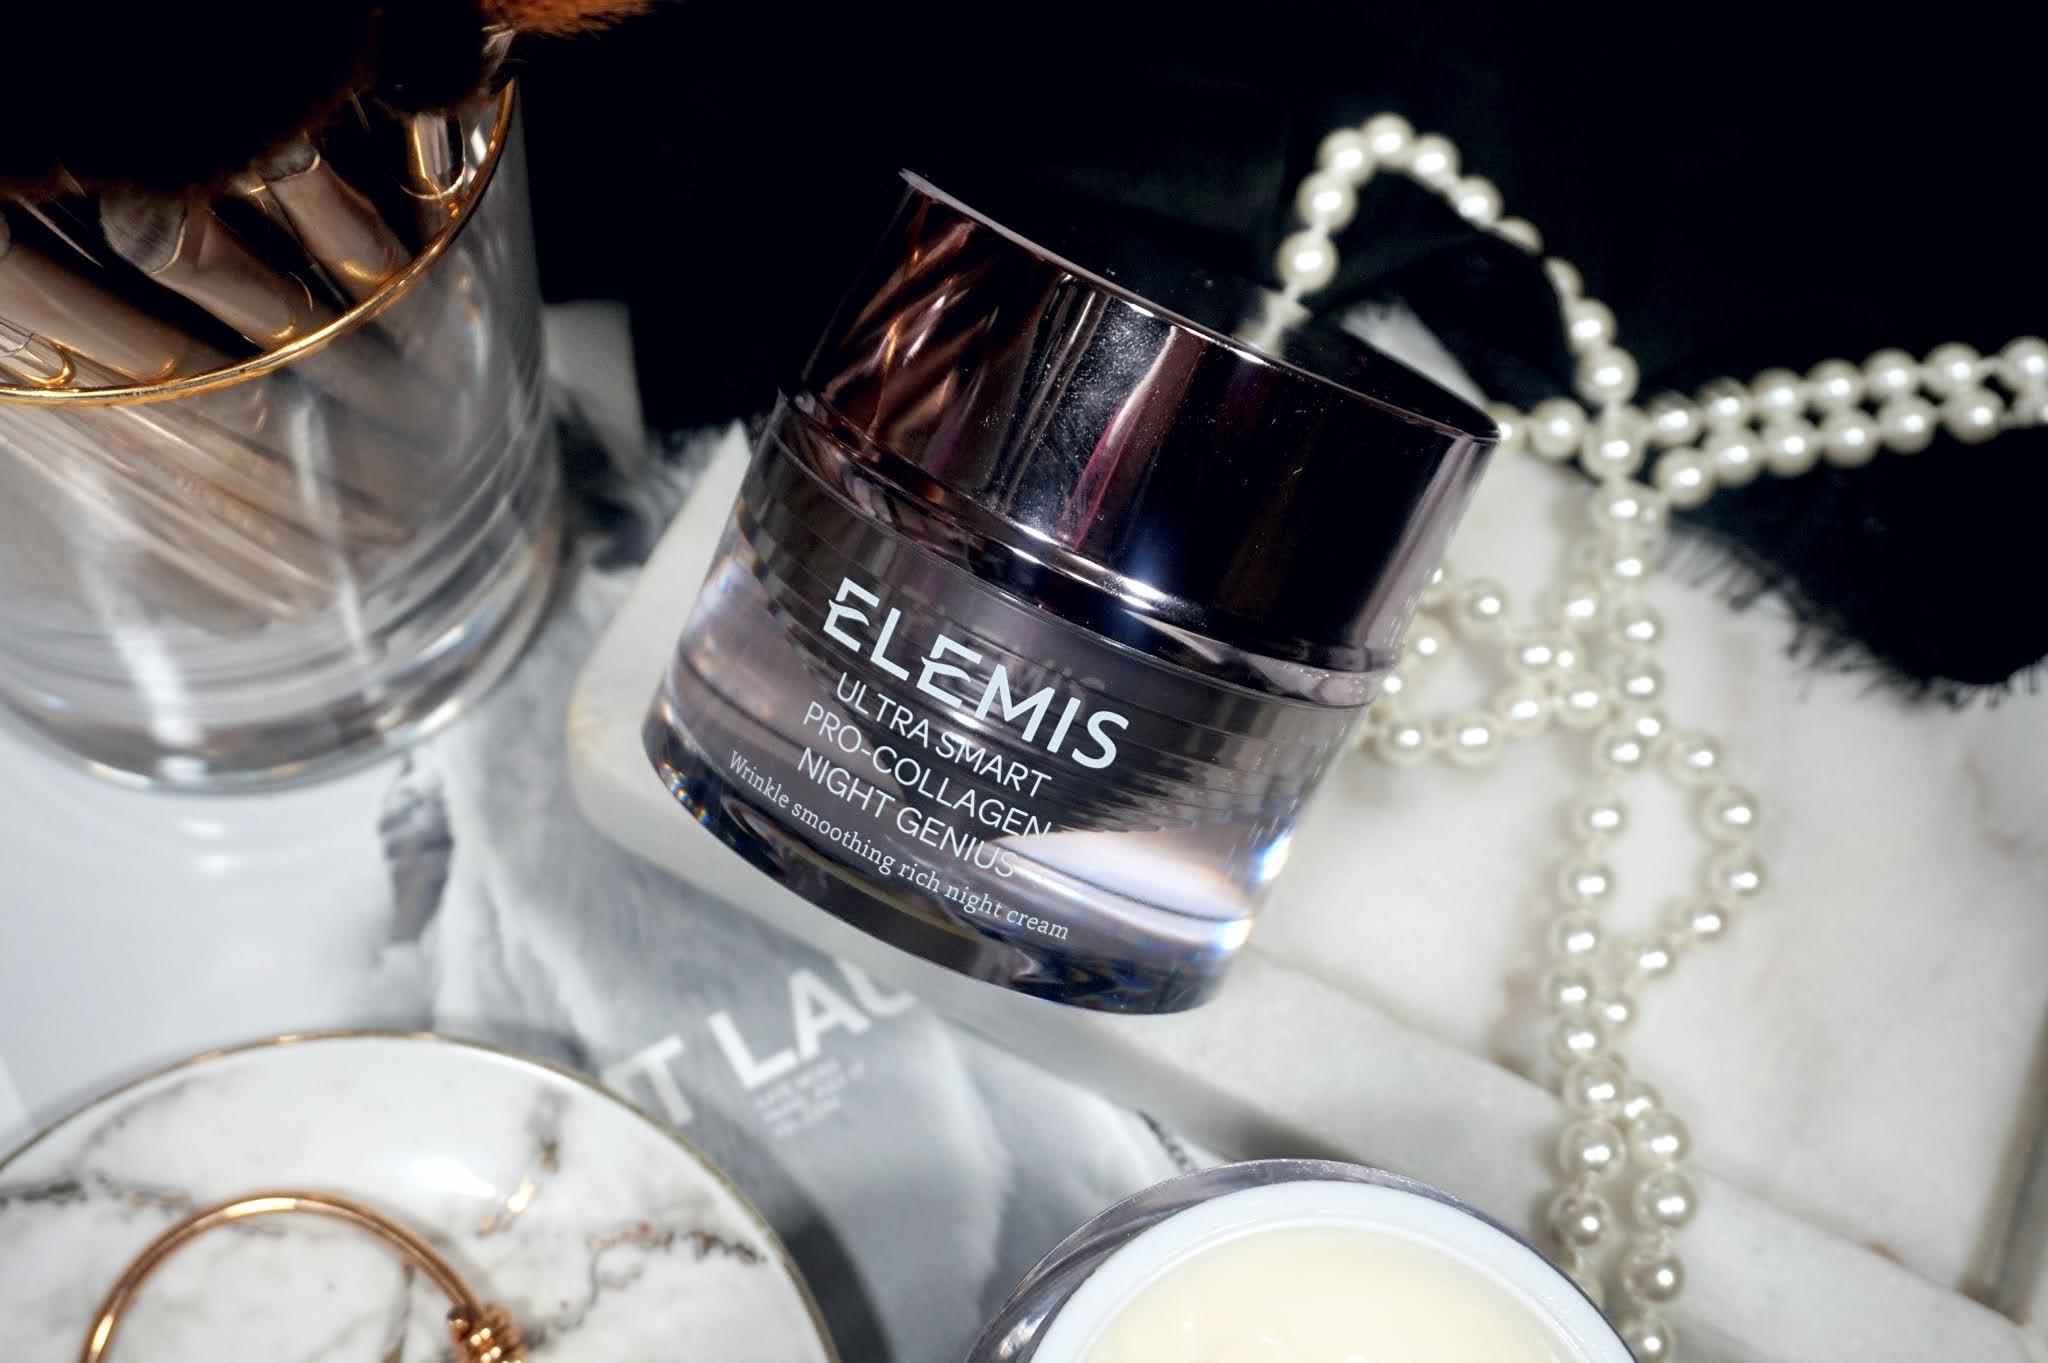 Elemis ULTRA SMART Pro-Collagen Night Genius Review